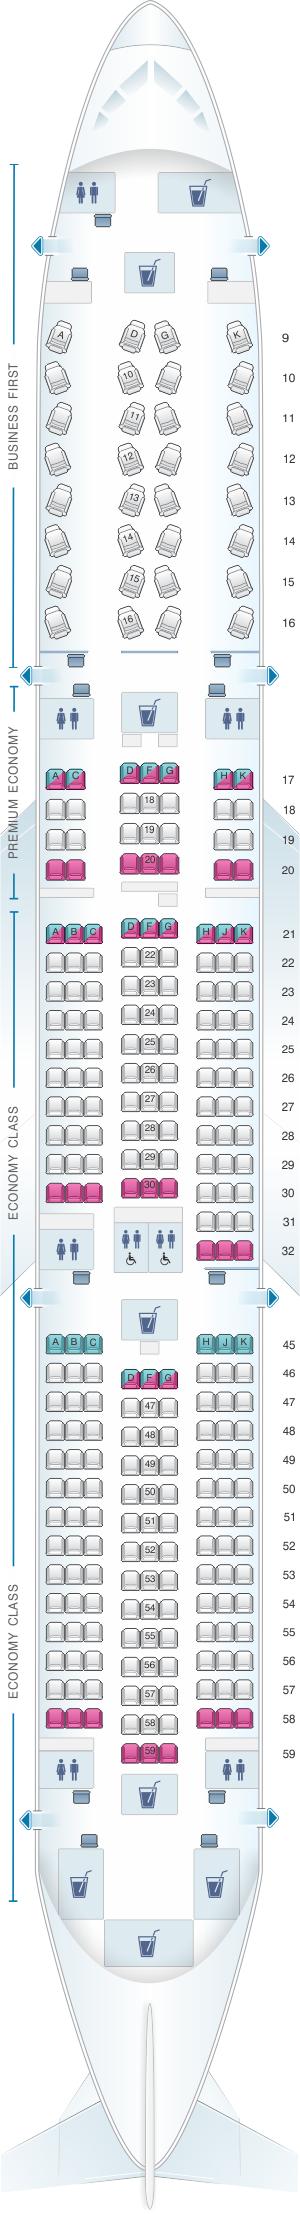 Seat map for El Al Israel Airlines Boeing B787 9